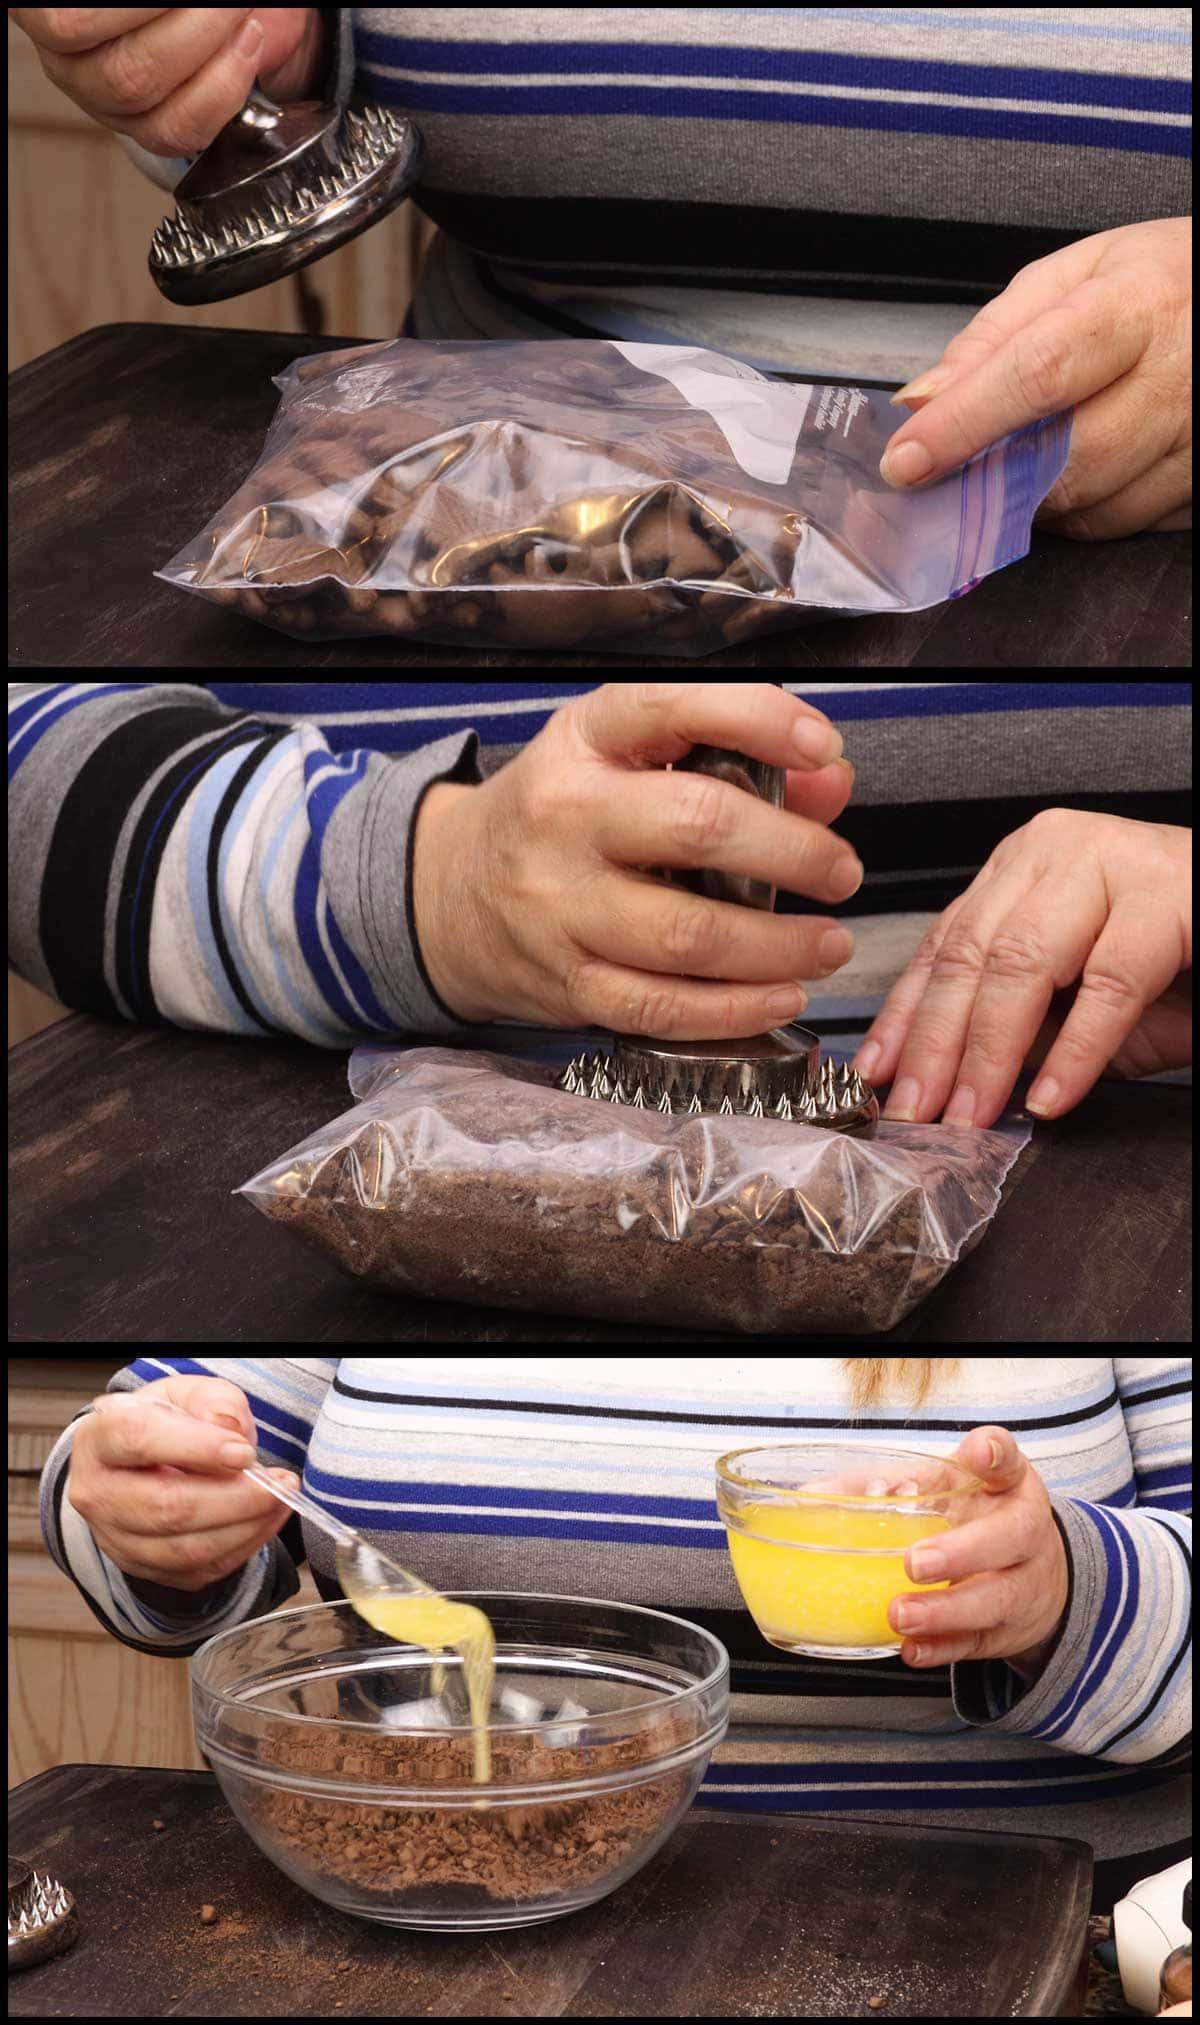 crushing the chocolate animal crackers by hand